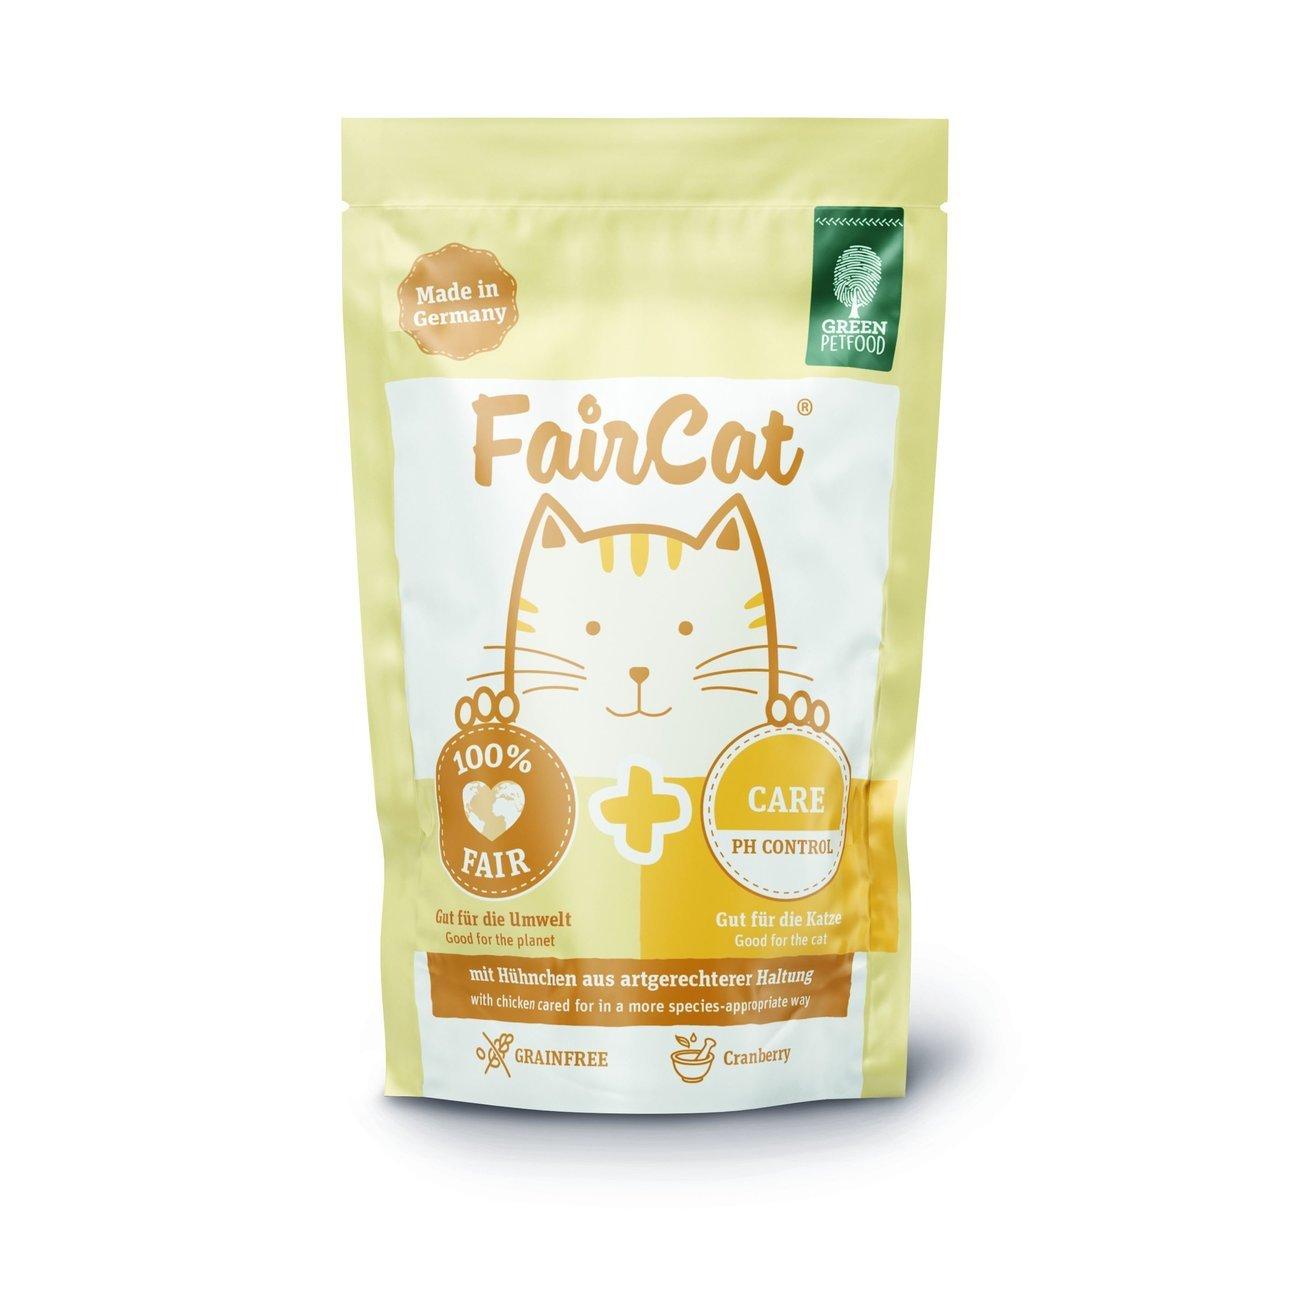 Green Petfood FairCat Care Katzenfutter